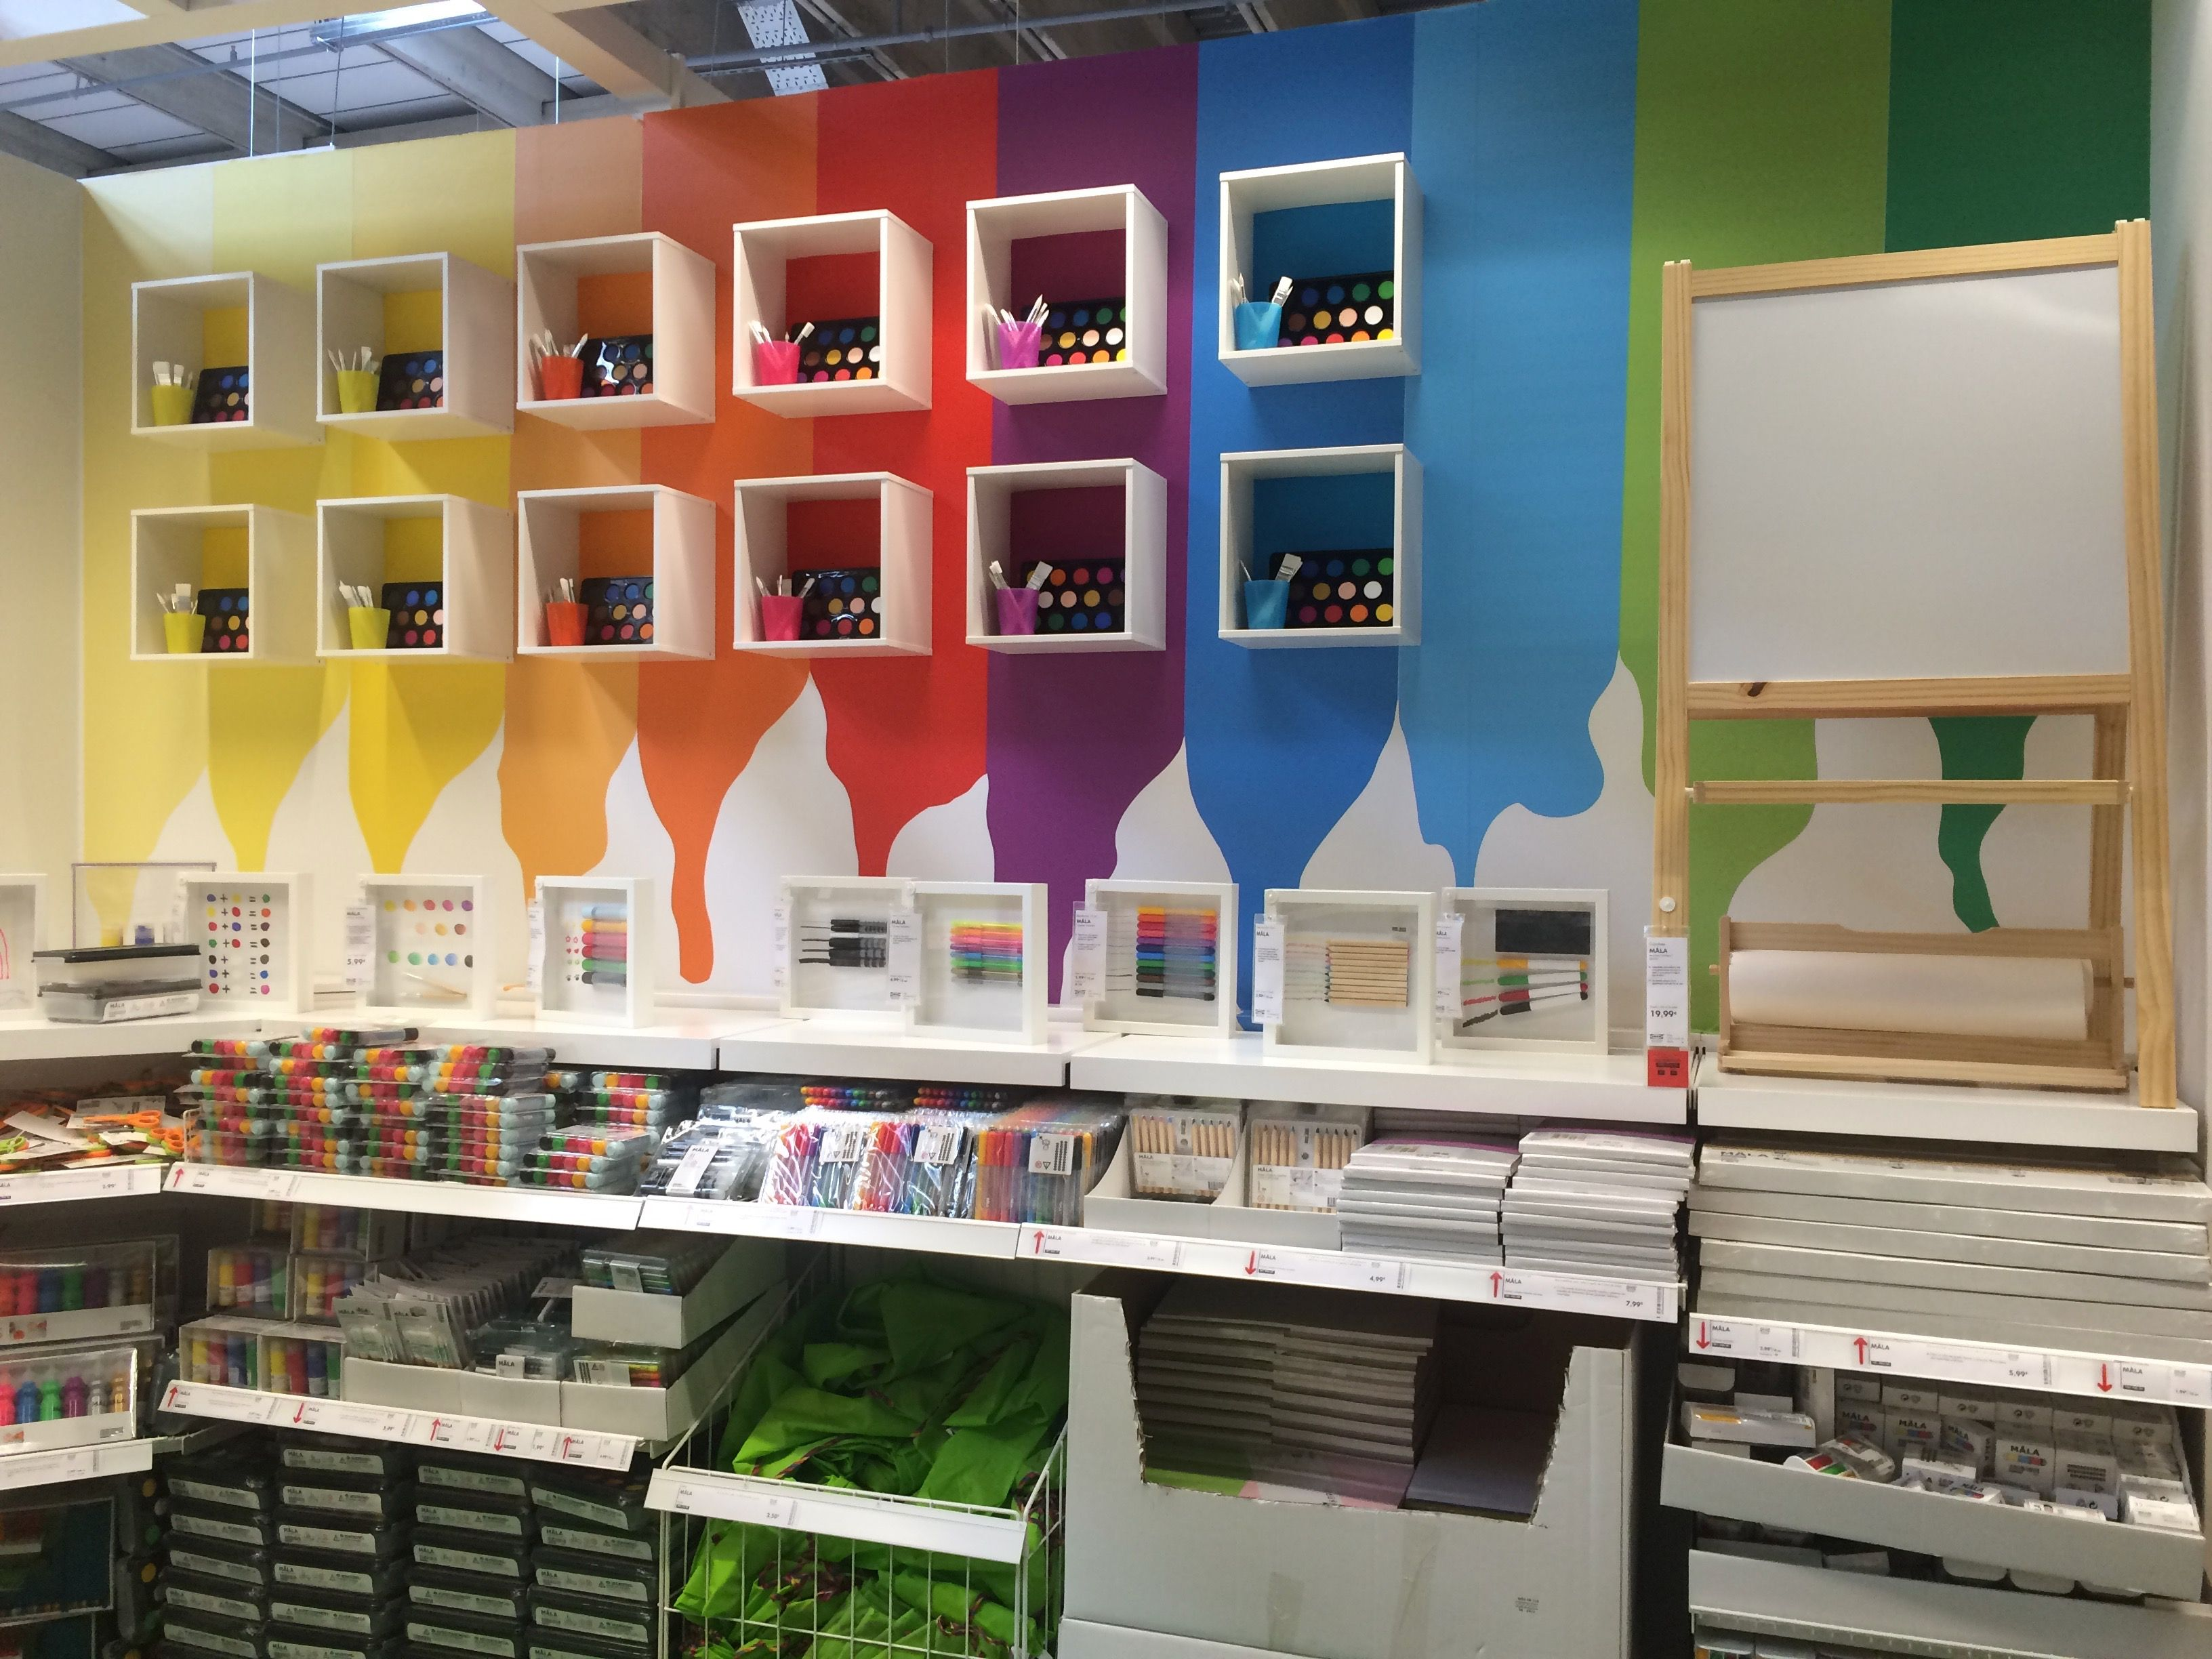 IKEA Alcorcon Madrid Childrenus art supply display alcorcon